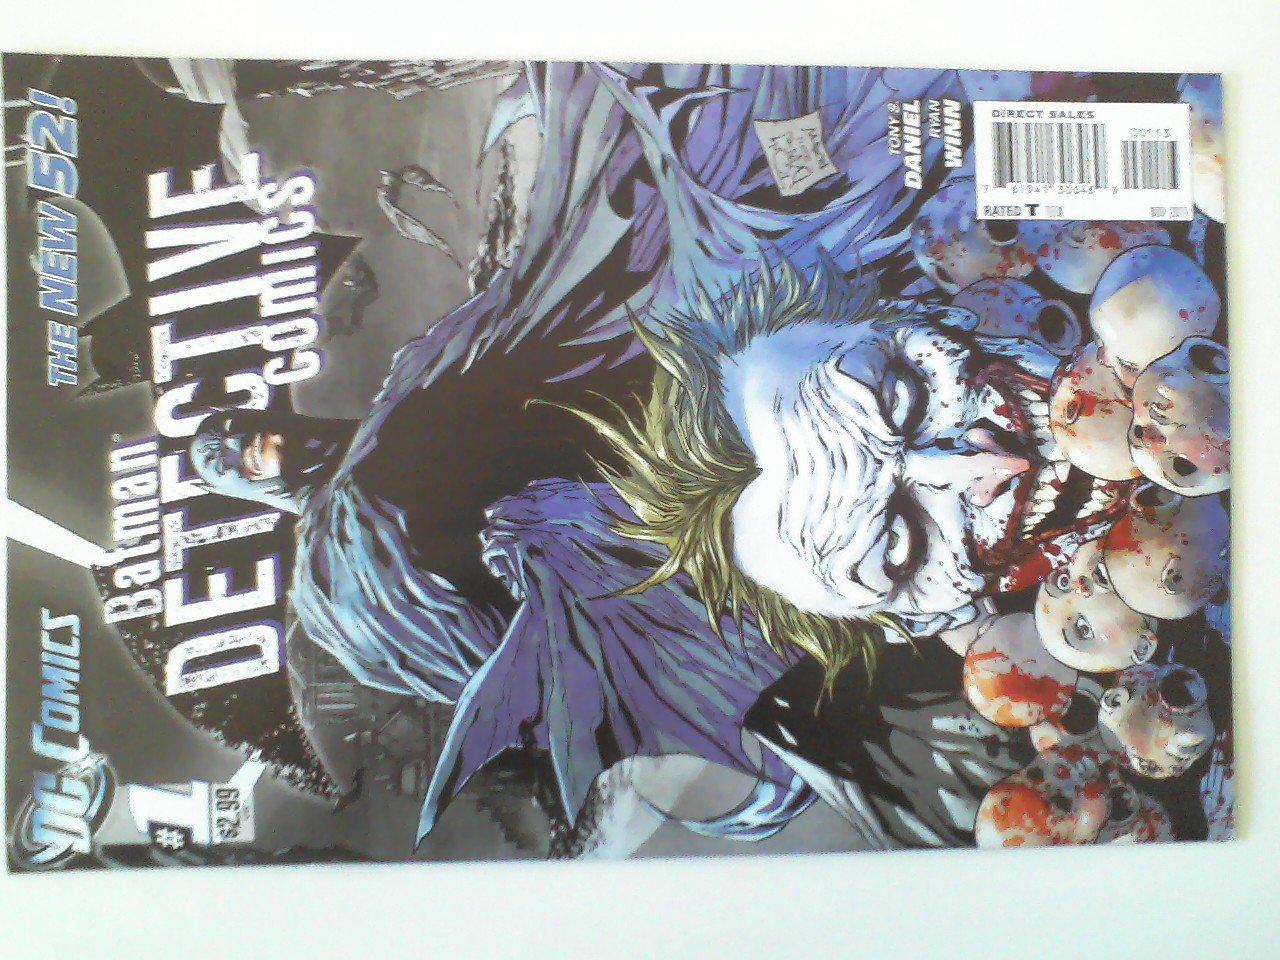 Detective Comics #1 The new 52 Joker #2, #23 Variant Sketch Cover ,#627